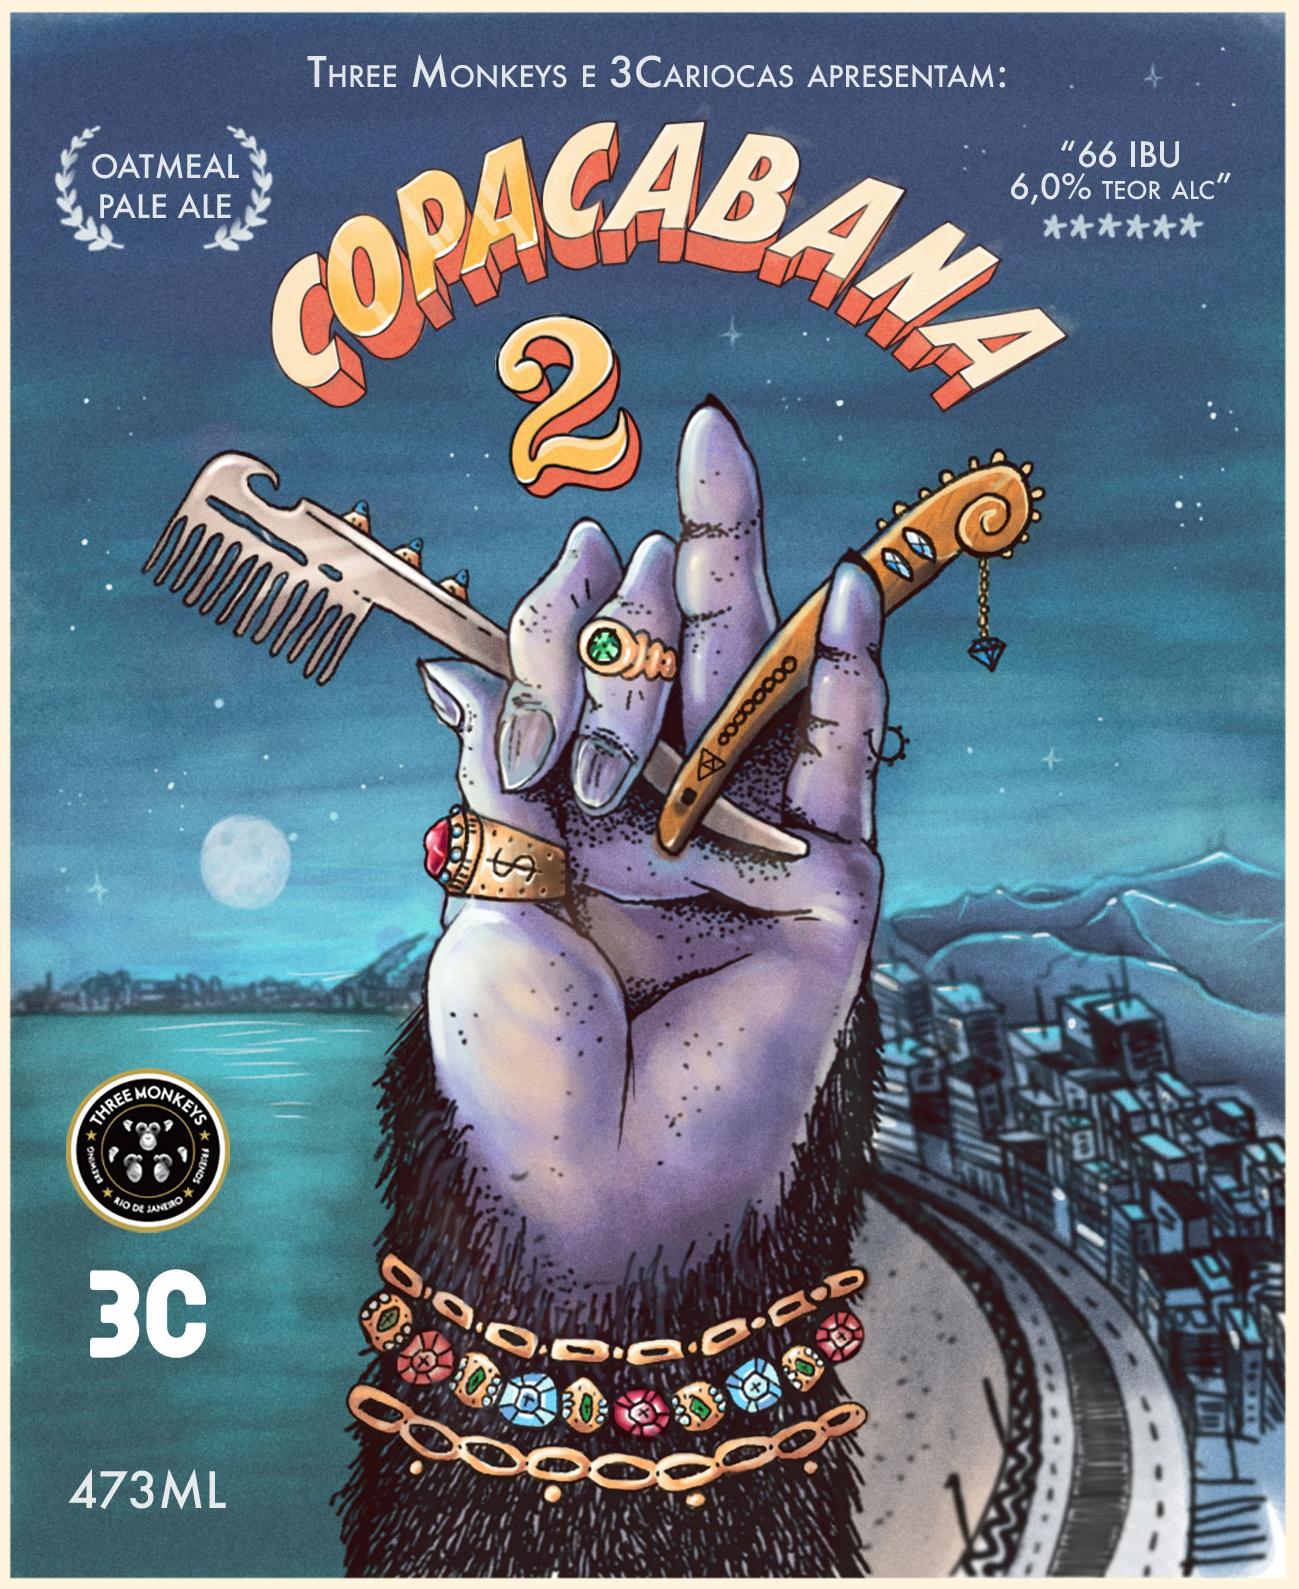 copacabana-2